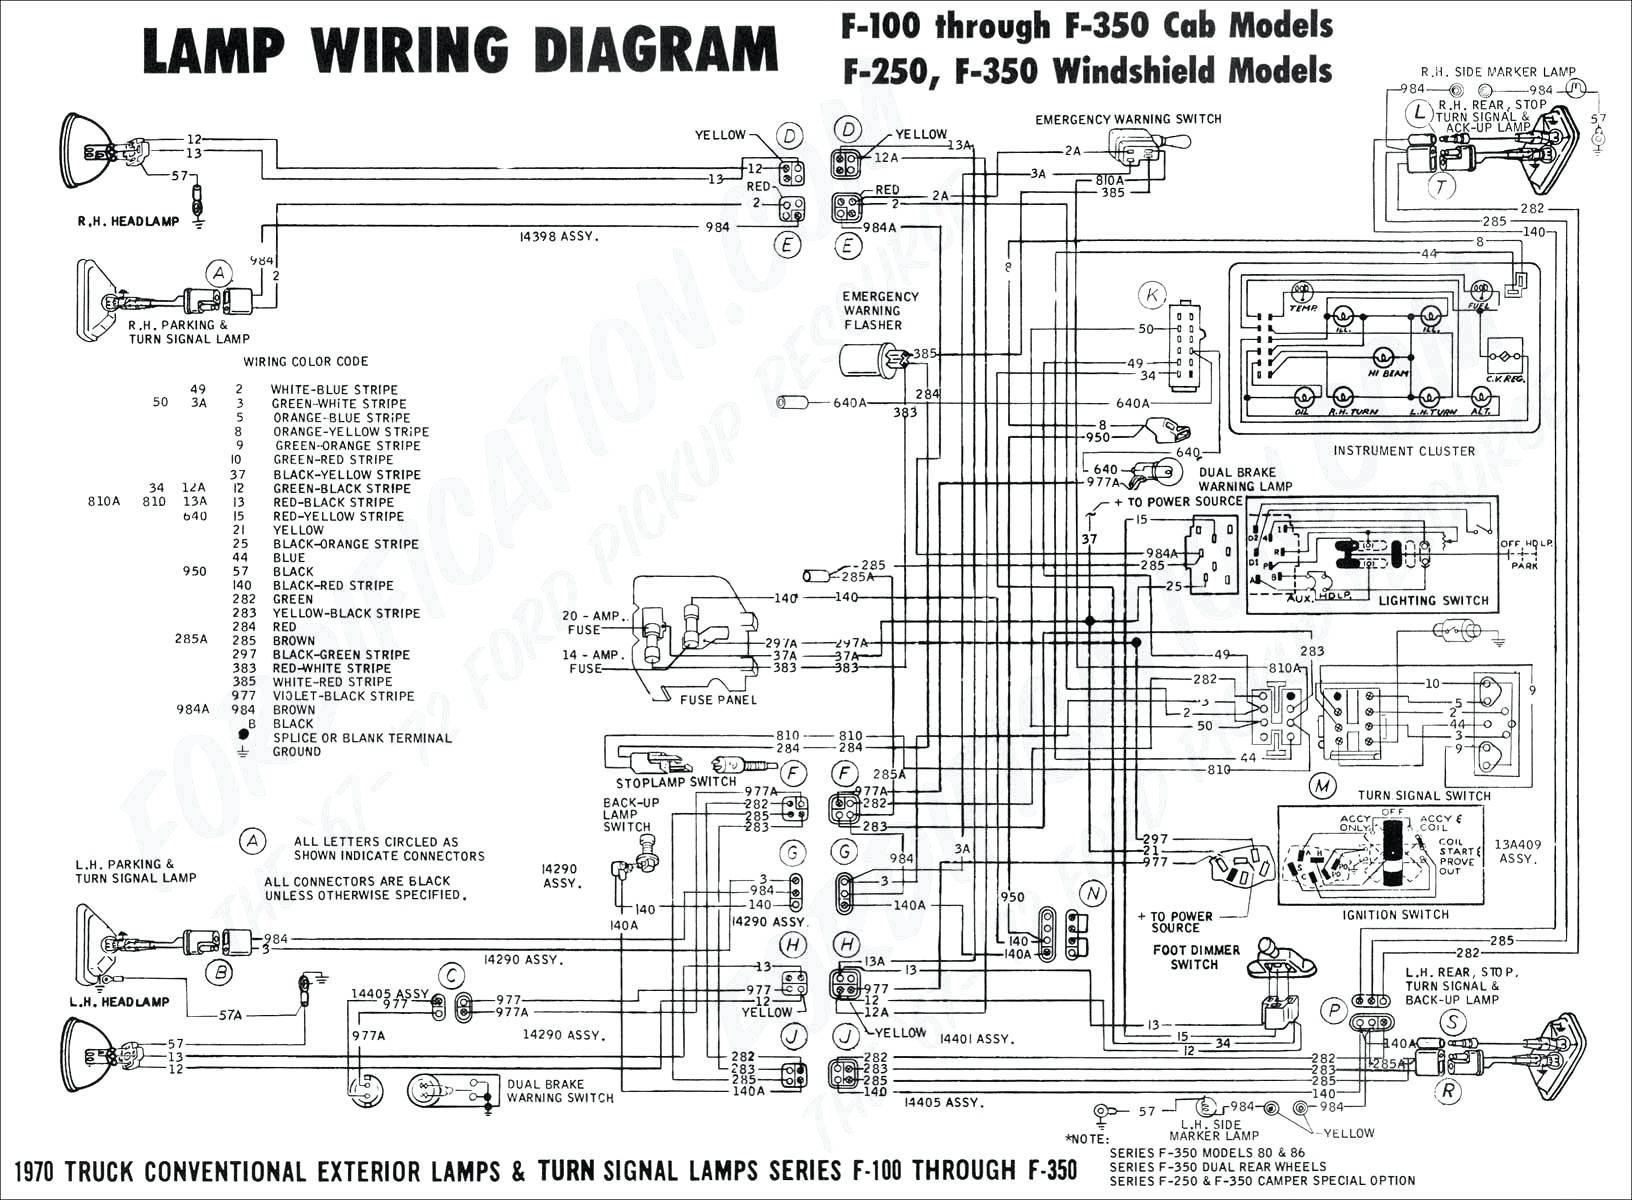 detroit dd13 wiring diagram